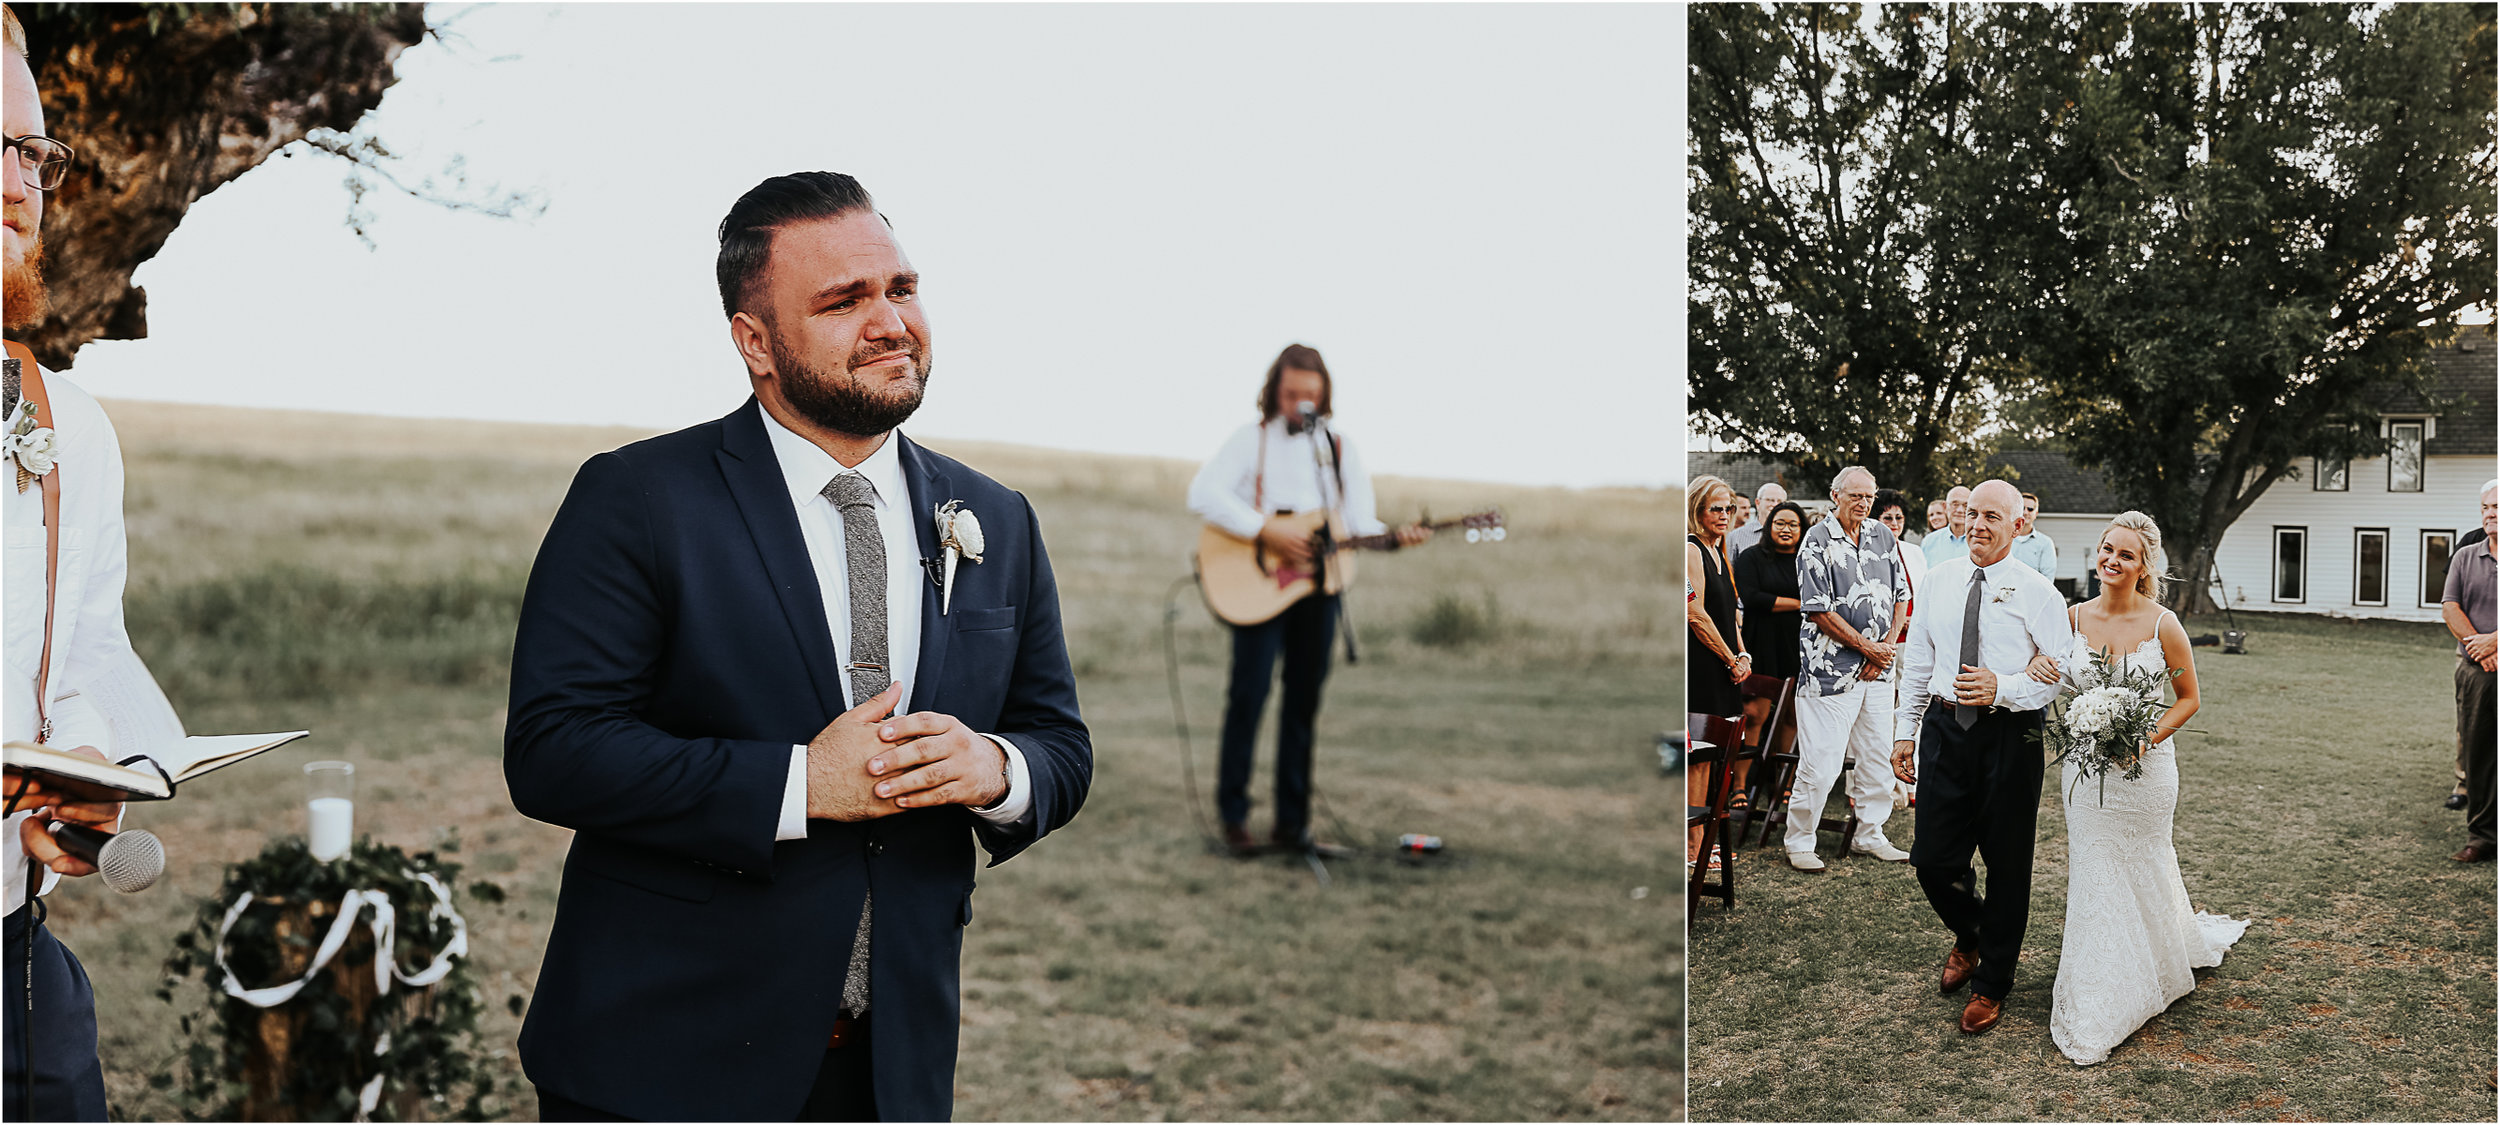 Backyard_Wedding_Oklahoma_MelissaMarshall_18.jpg